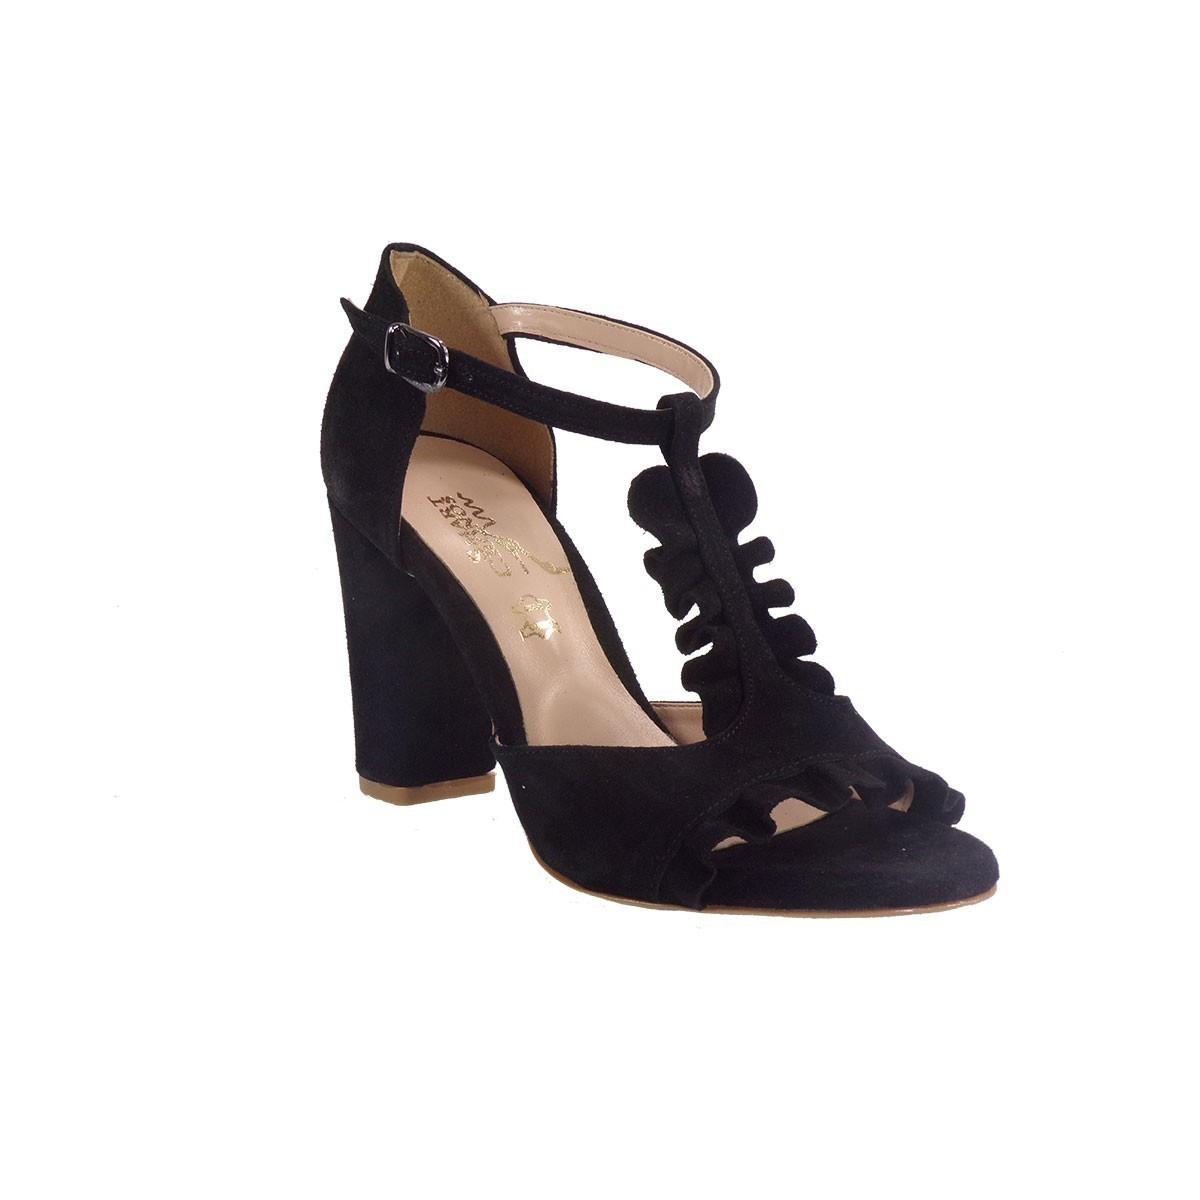 Smart Cronos Γυναικεία Παπούτσια Πέδιλα 6817-544 Μαύρο Καστόρι Δέρμα